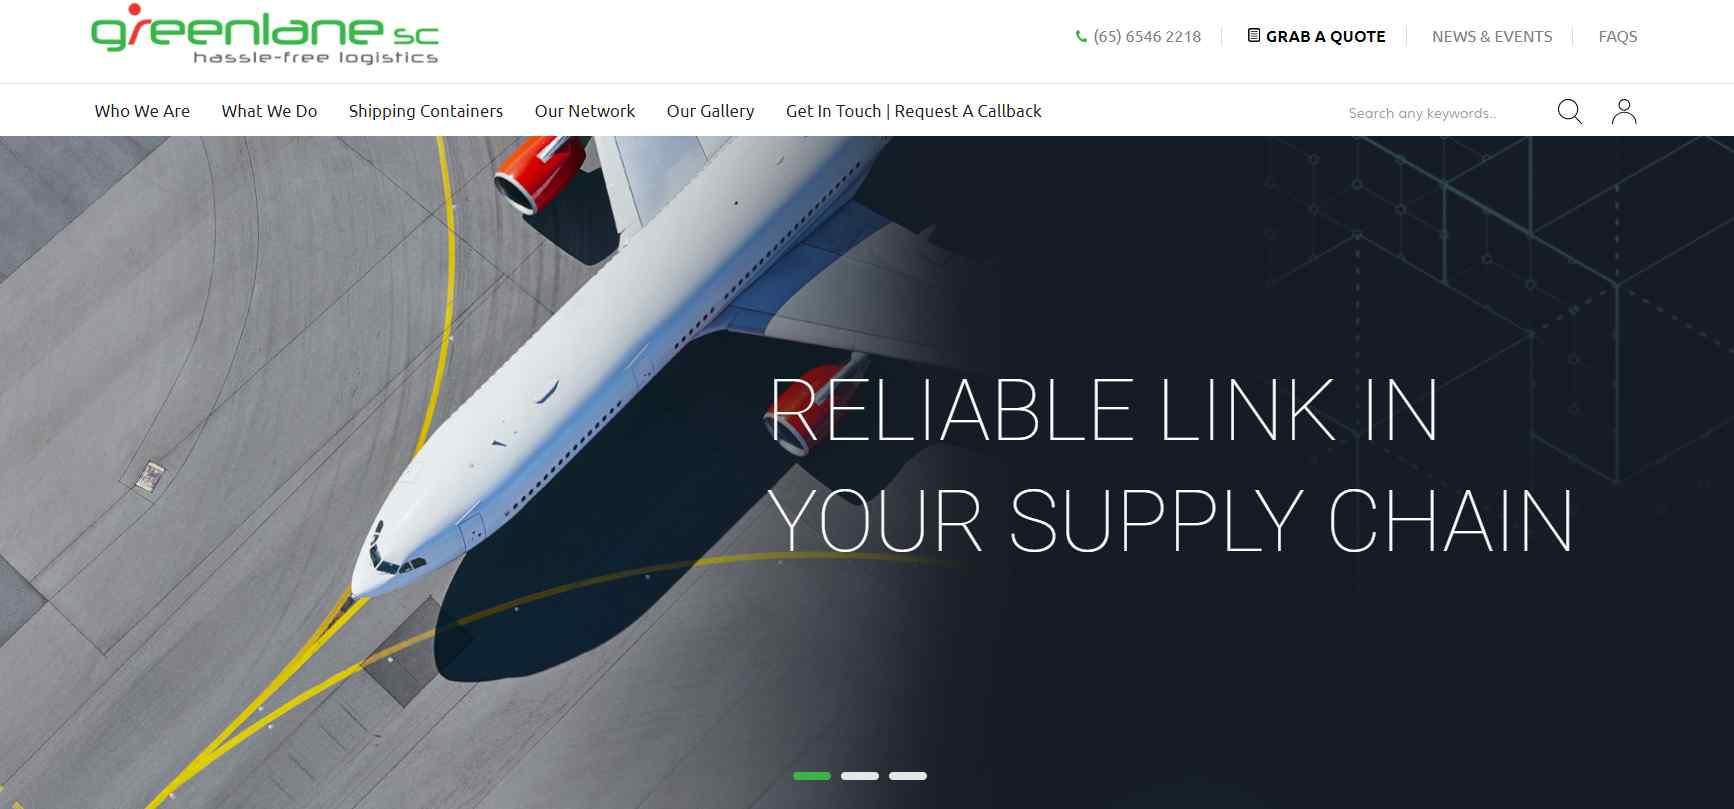 greenlane Top Logistics Companies in Singapore